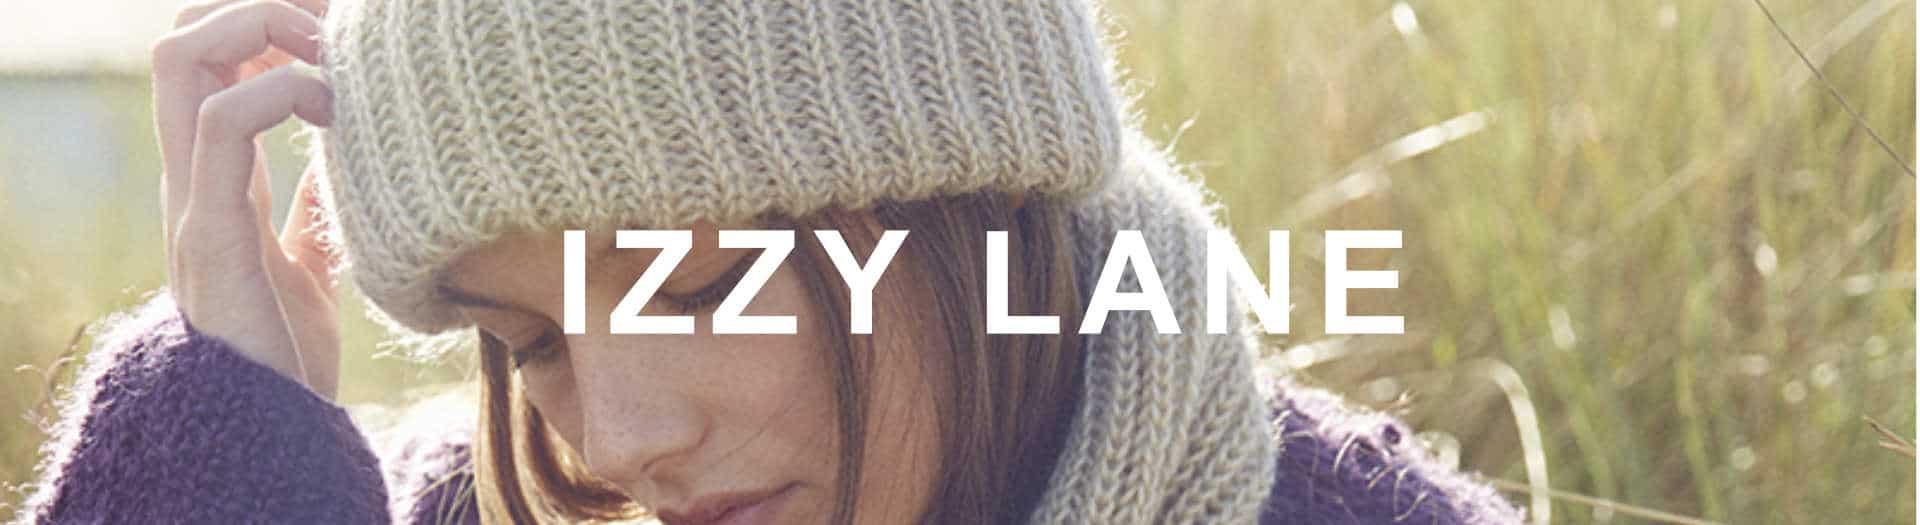 1920x525 izzy lane header with logo